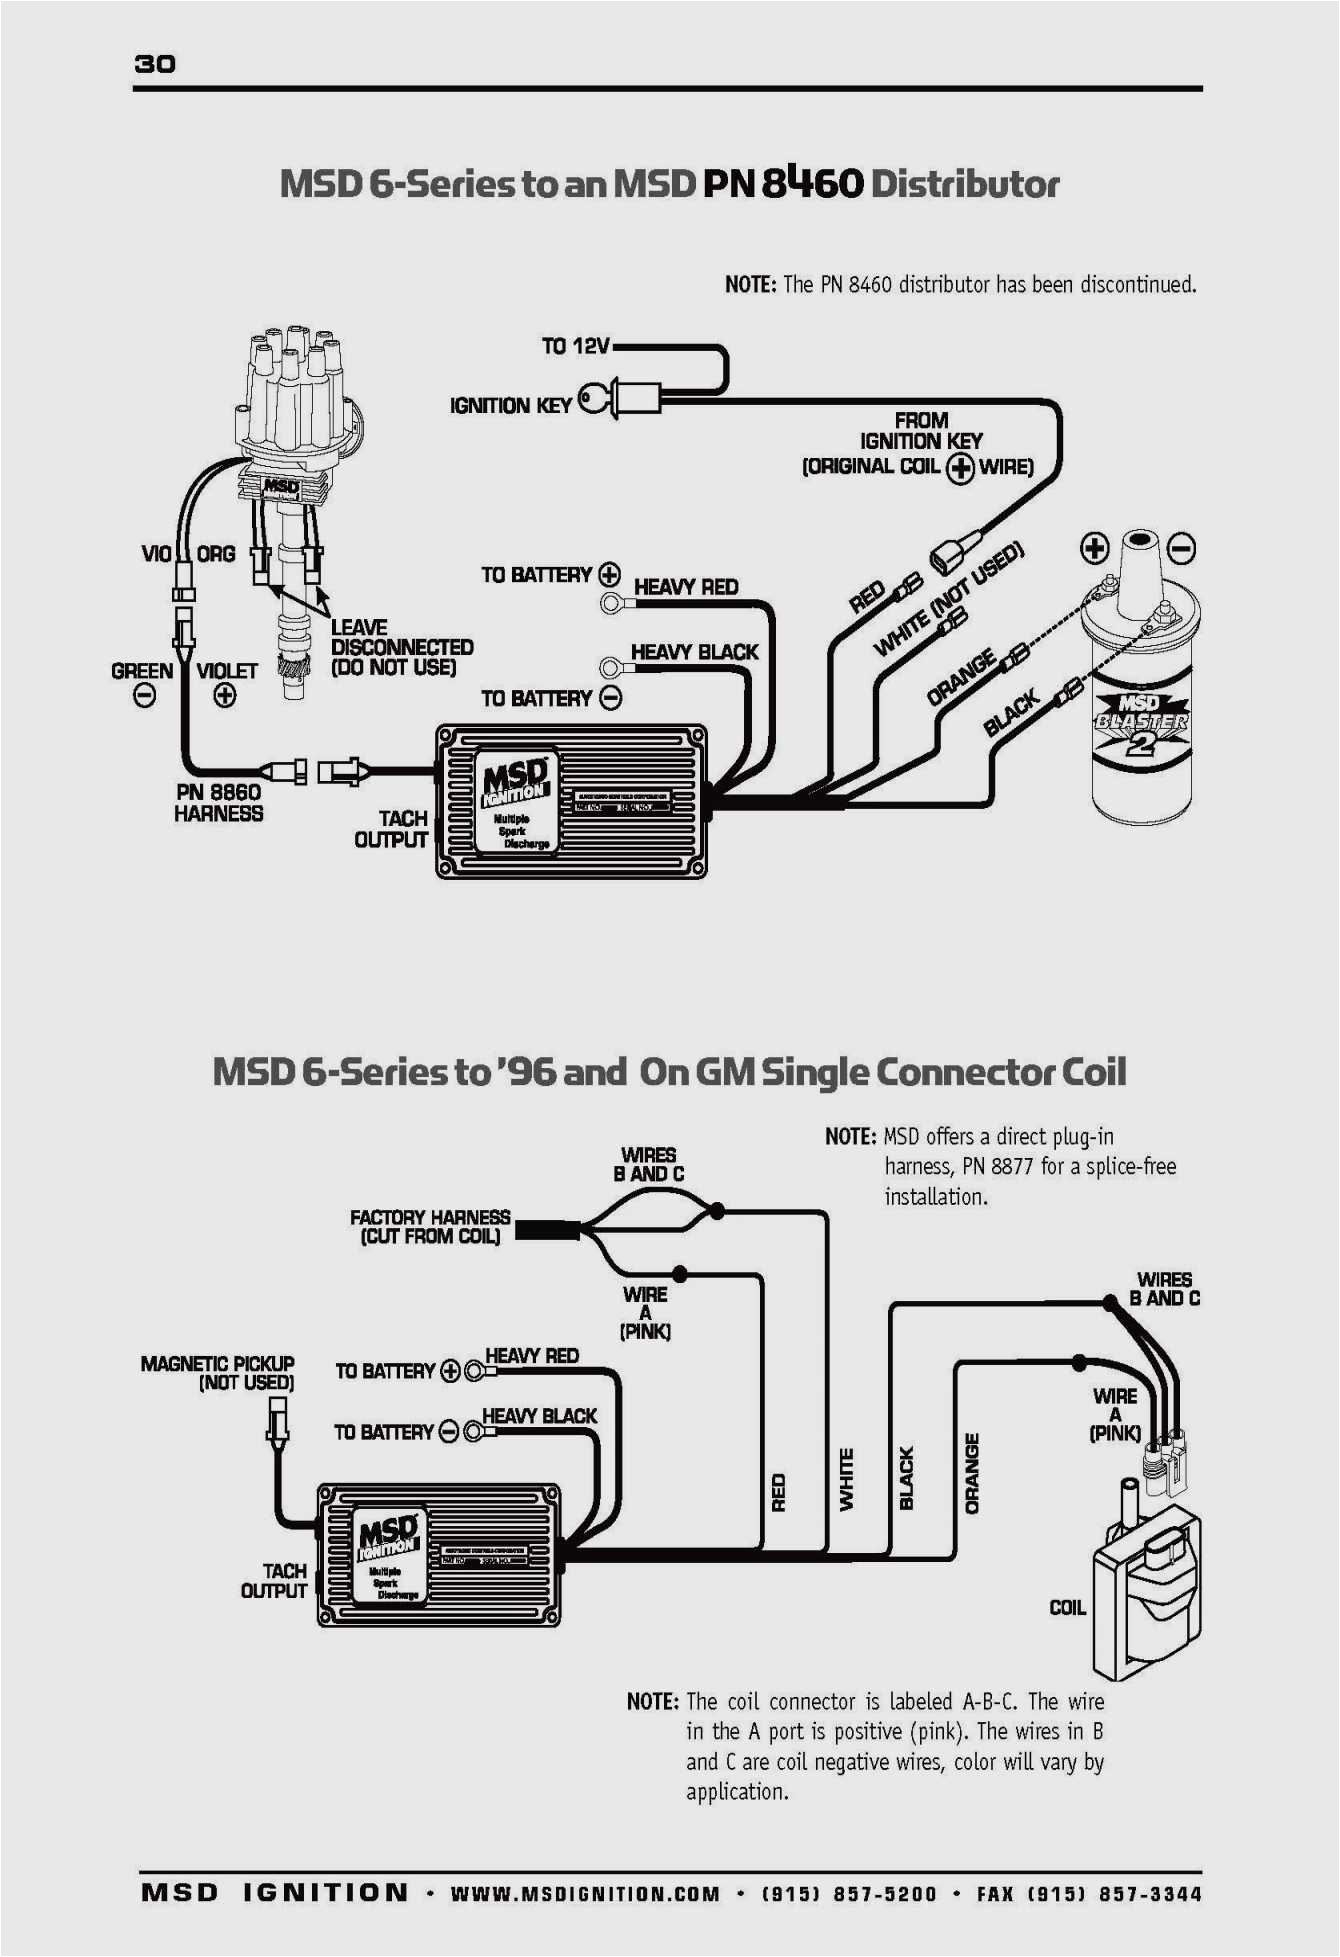 msd pn 6425 wiring diagram msd 6aln wiring diagrams ford trusted wiring diagrams e280a2 of msd pn 6425 wiring diagram jpg